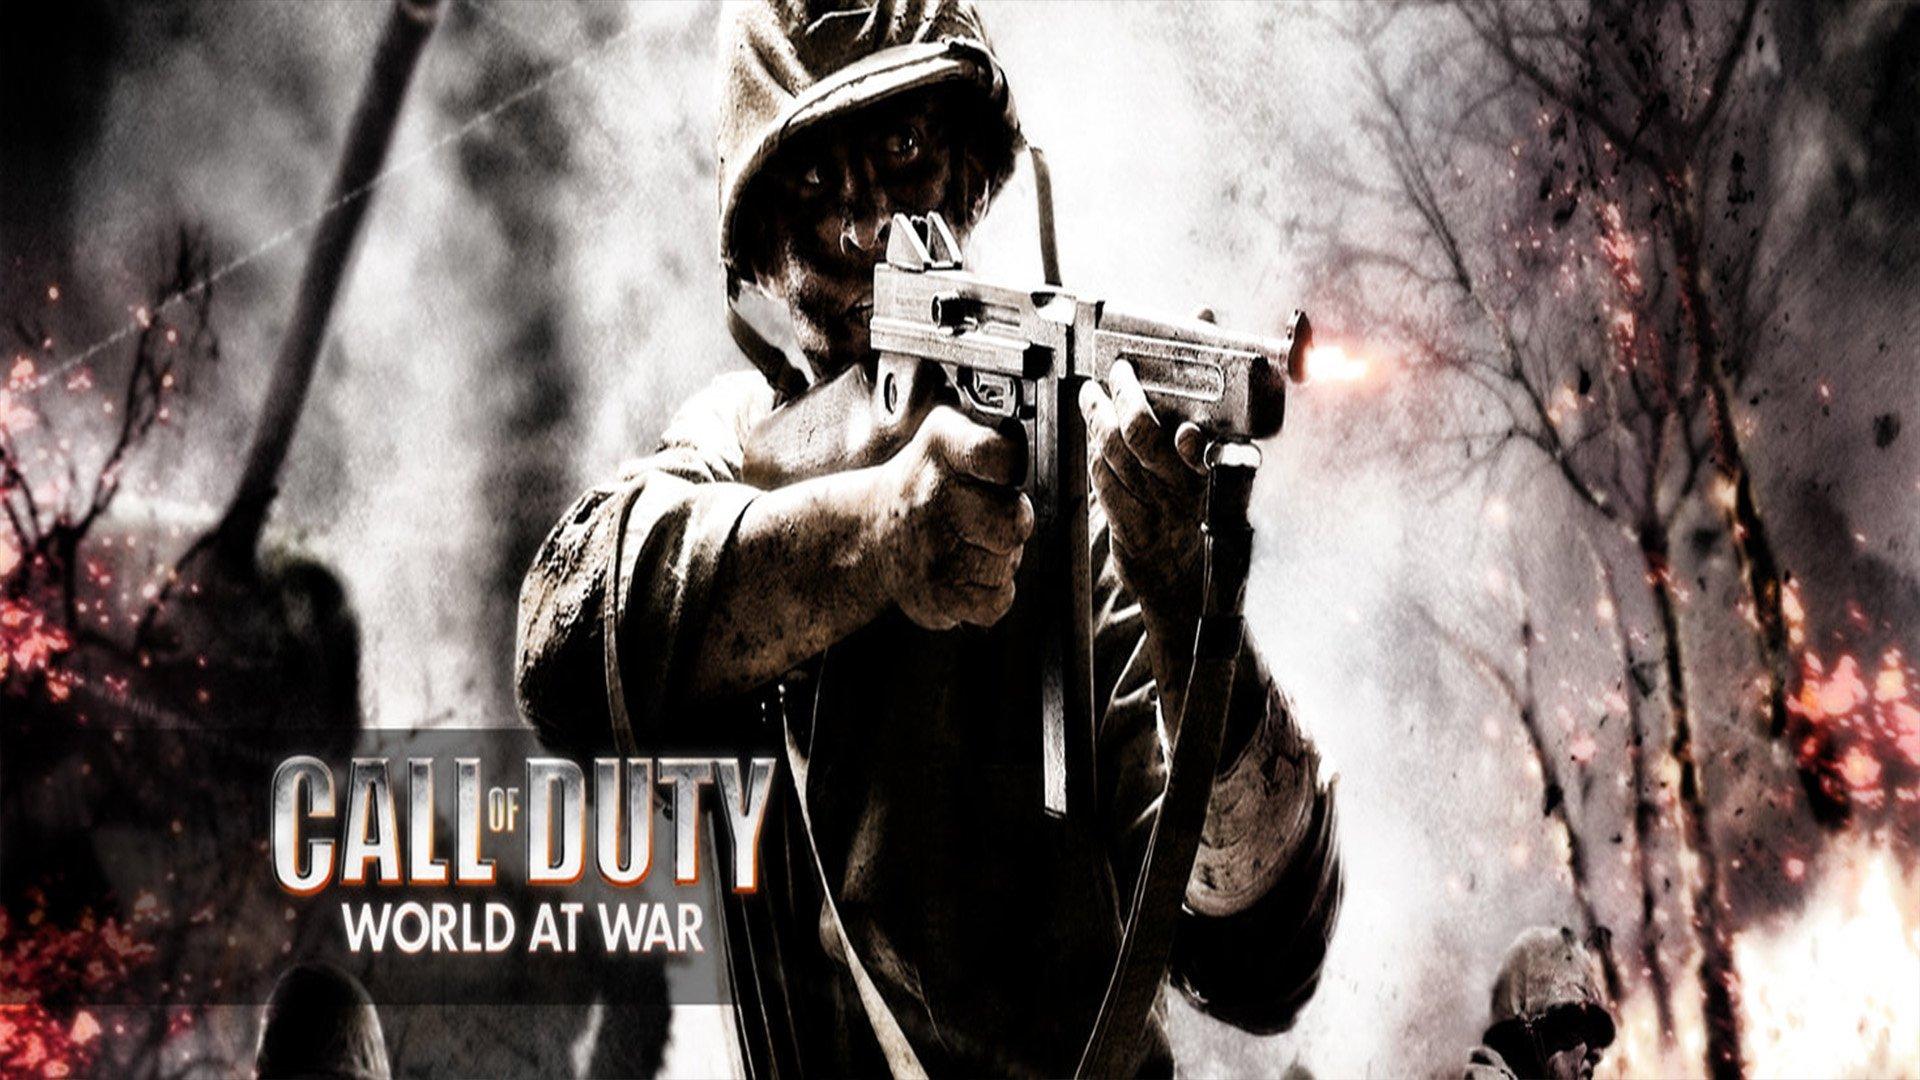 Call Of Duty World At War Wallpaper: Call Of Duty: World At War HD Wallpaper